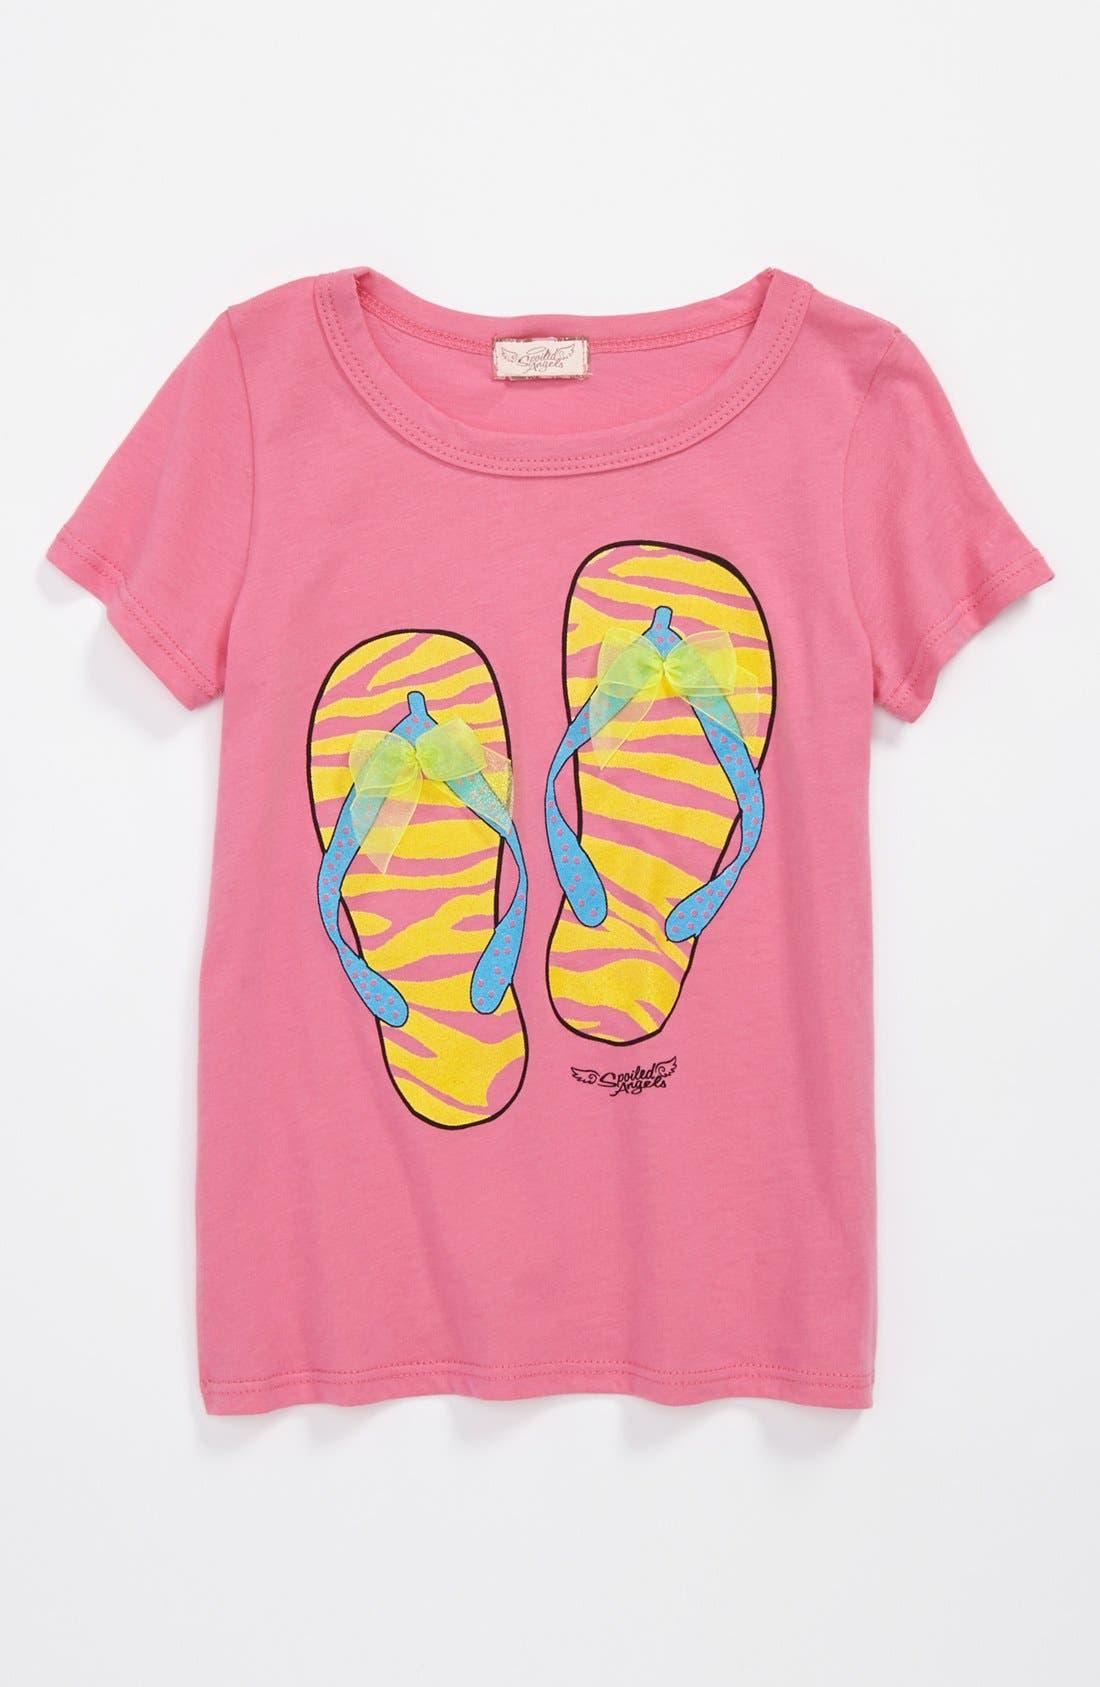 Alternate Image 1 Selected - Spoiled Angels 'Flip Flop' Tee (Toddler Girls)